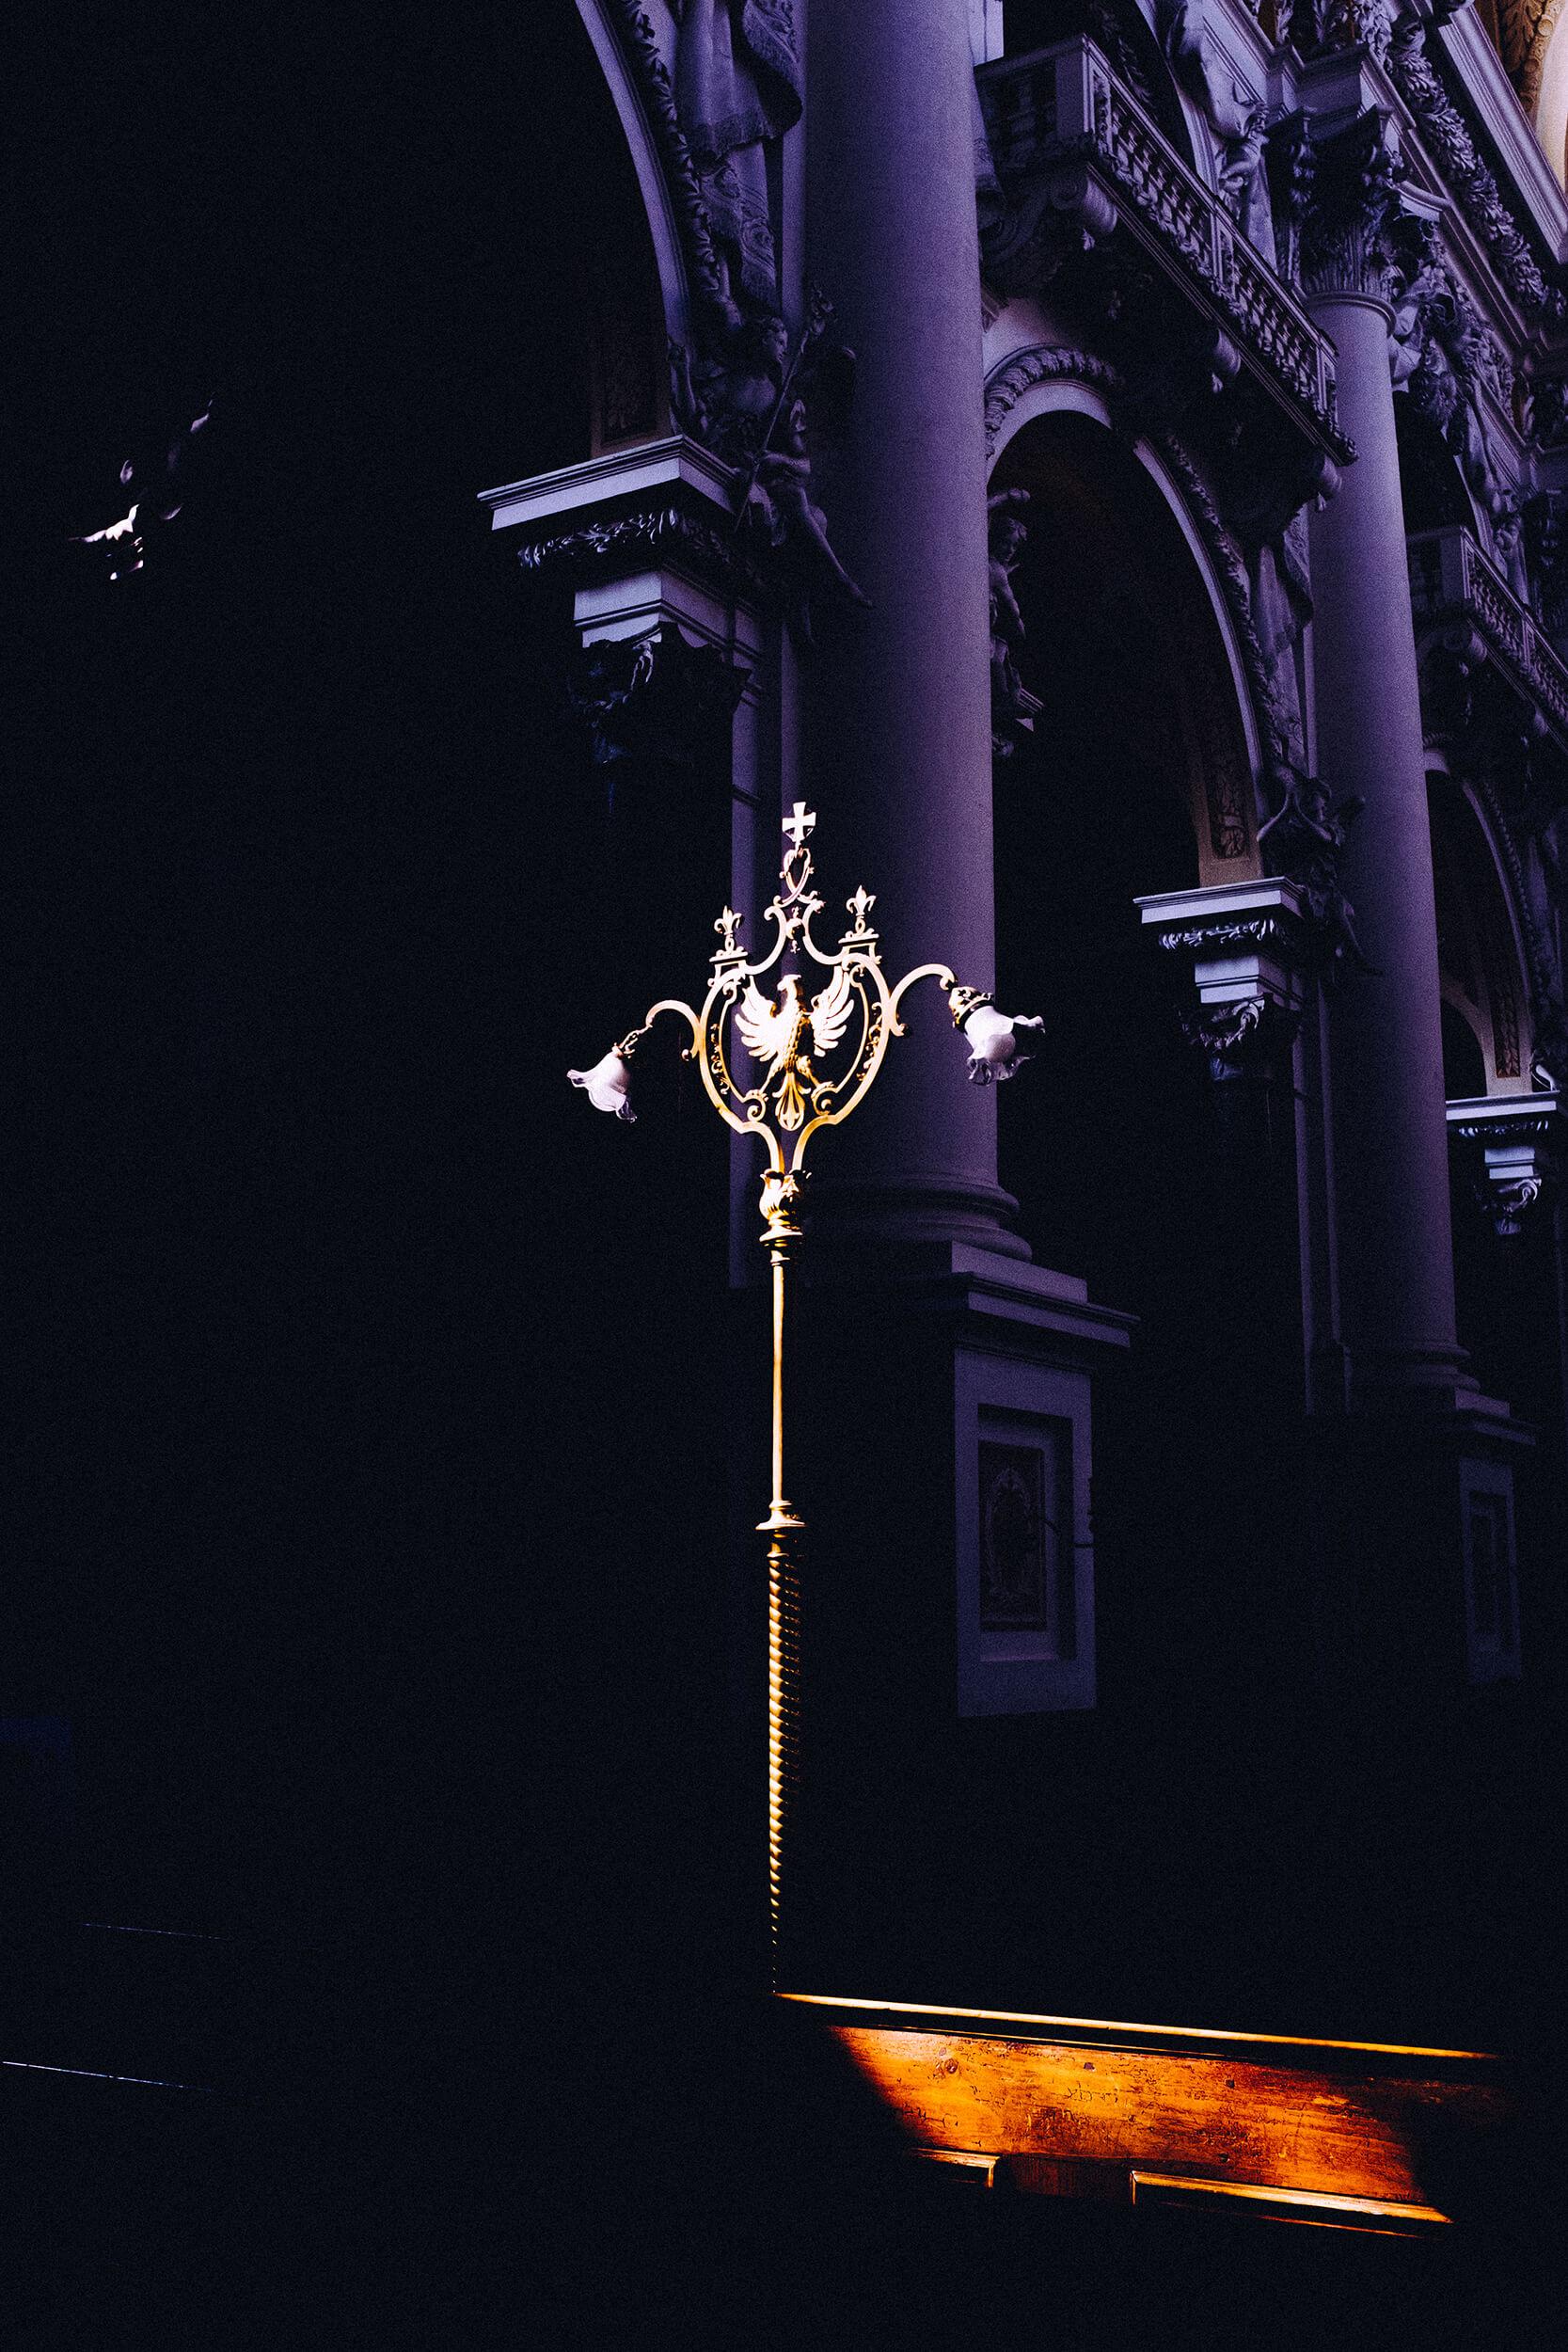 mystic-church-austria.jpg